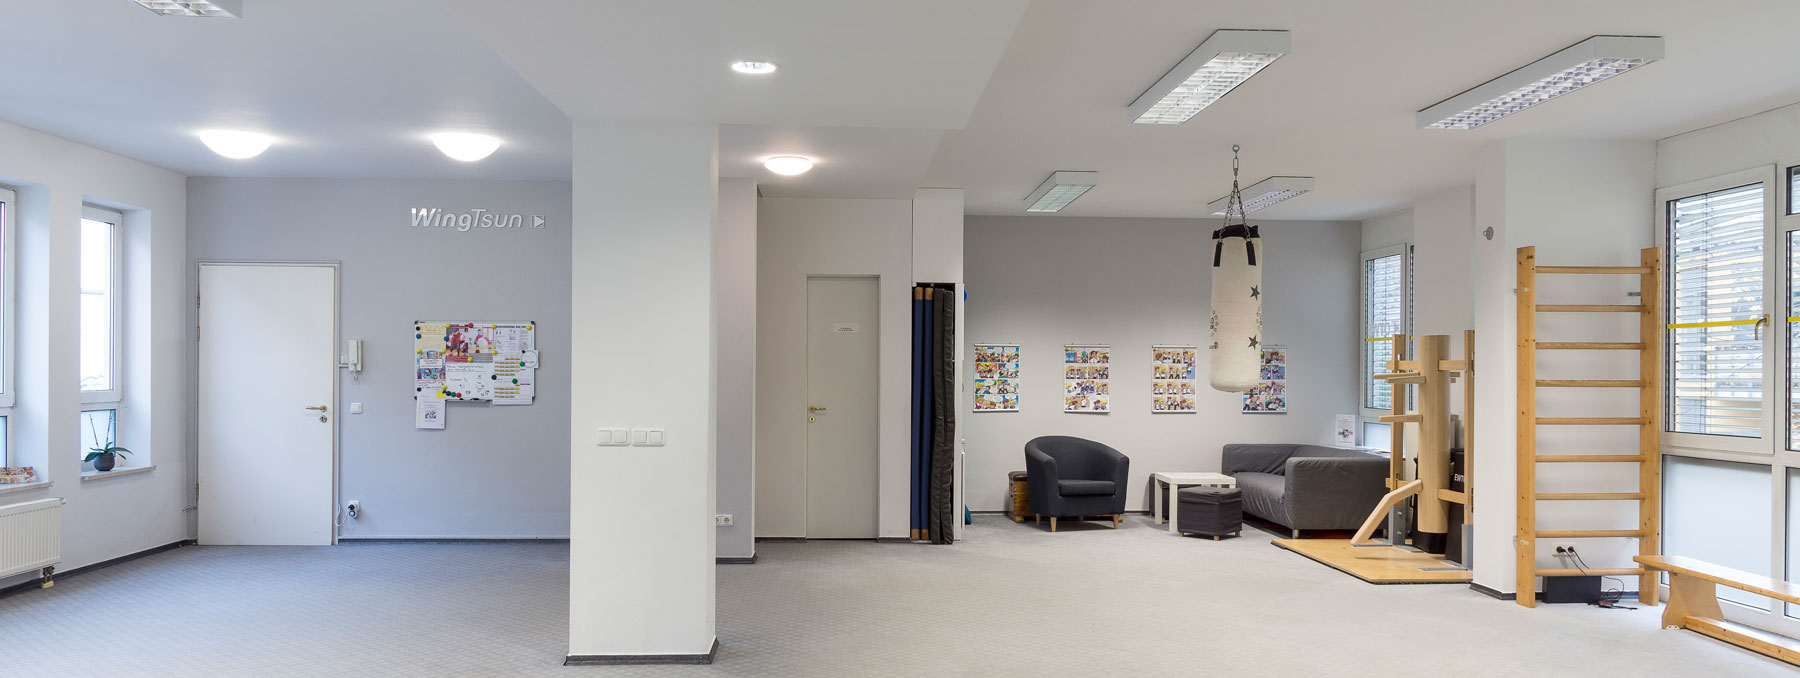 WTKFI Dresden Selbstverteidigung Studio